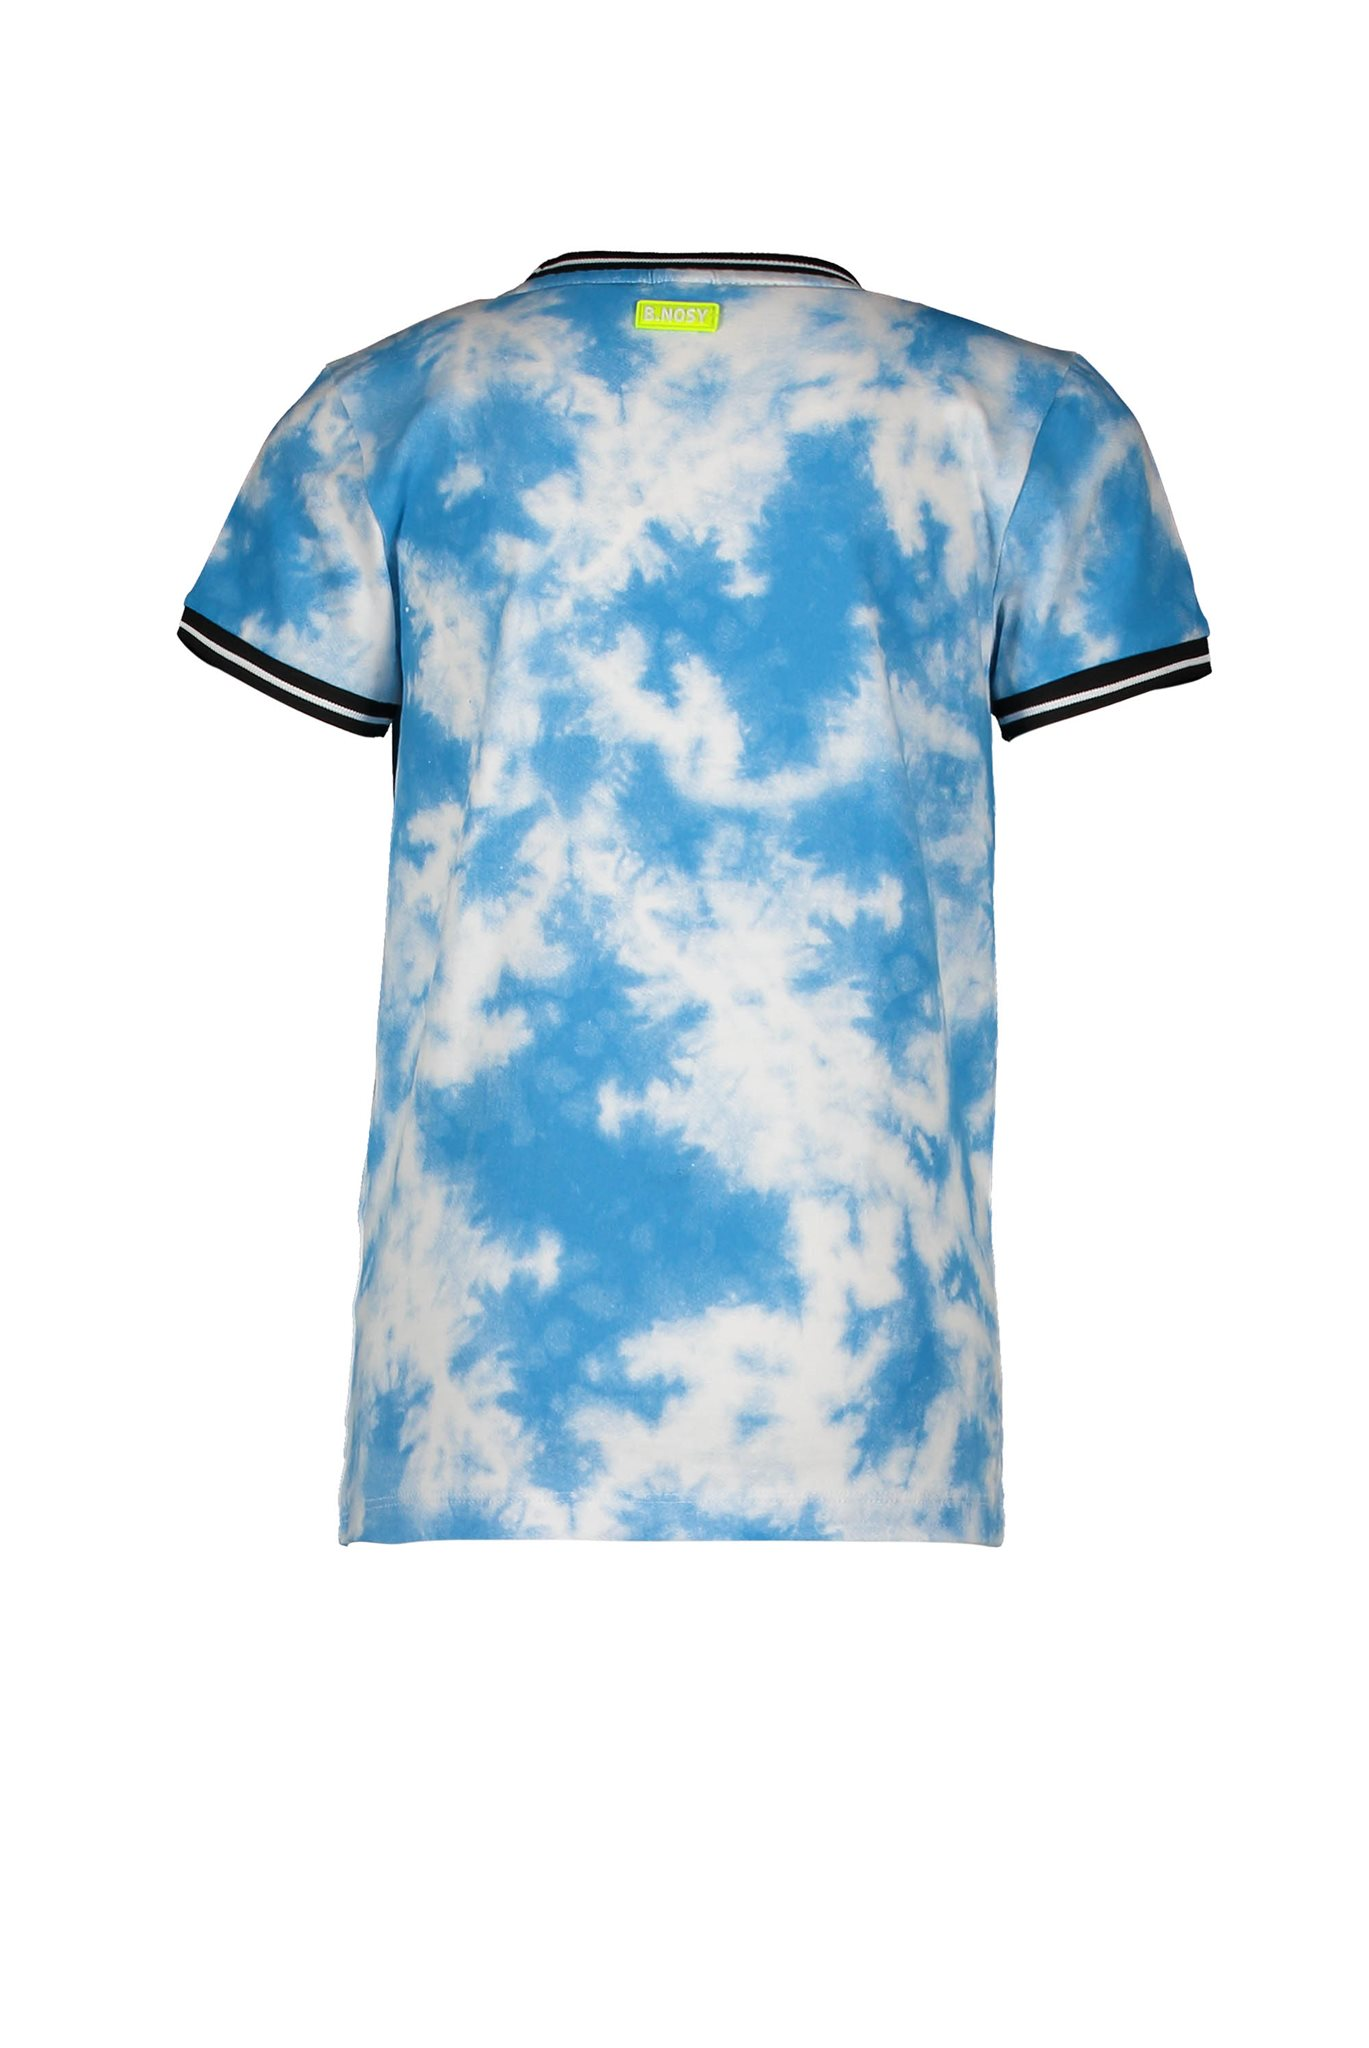 B.Nosy t-shirt Tie dye